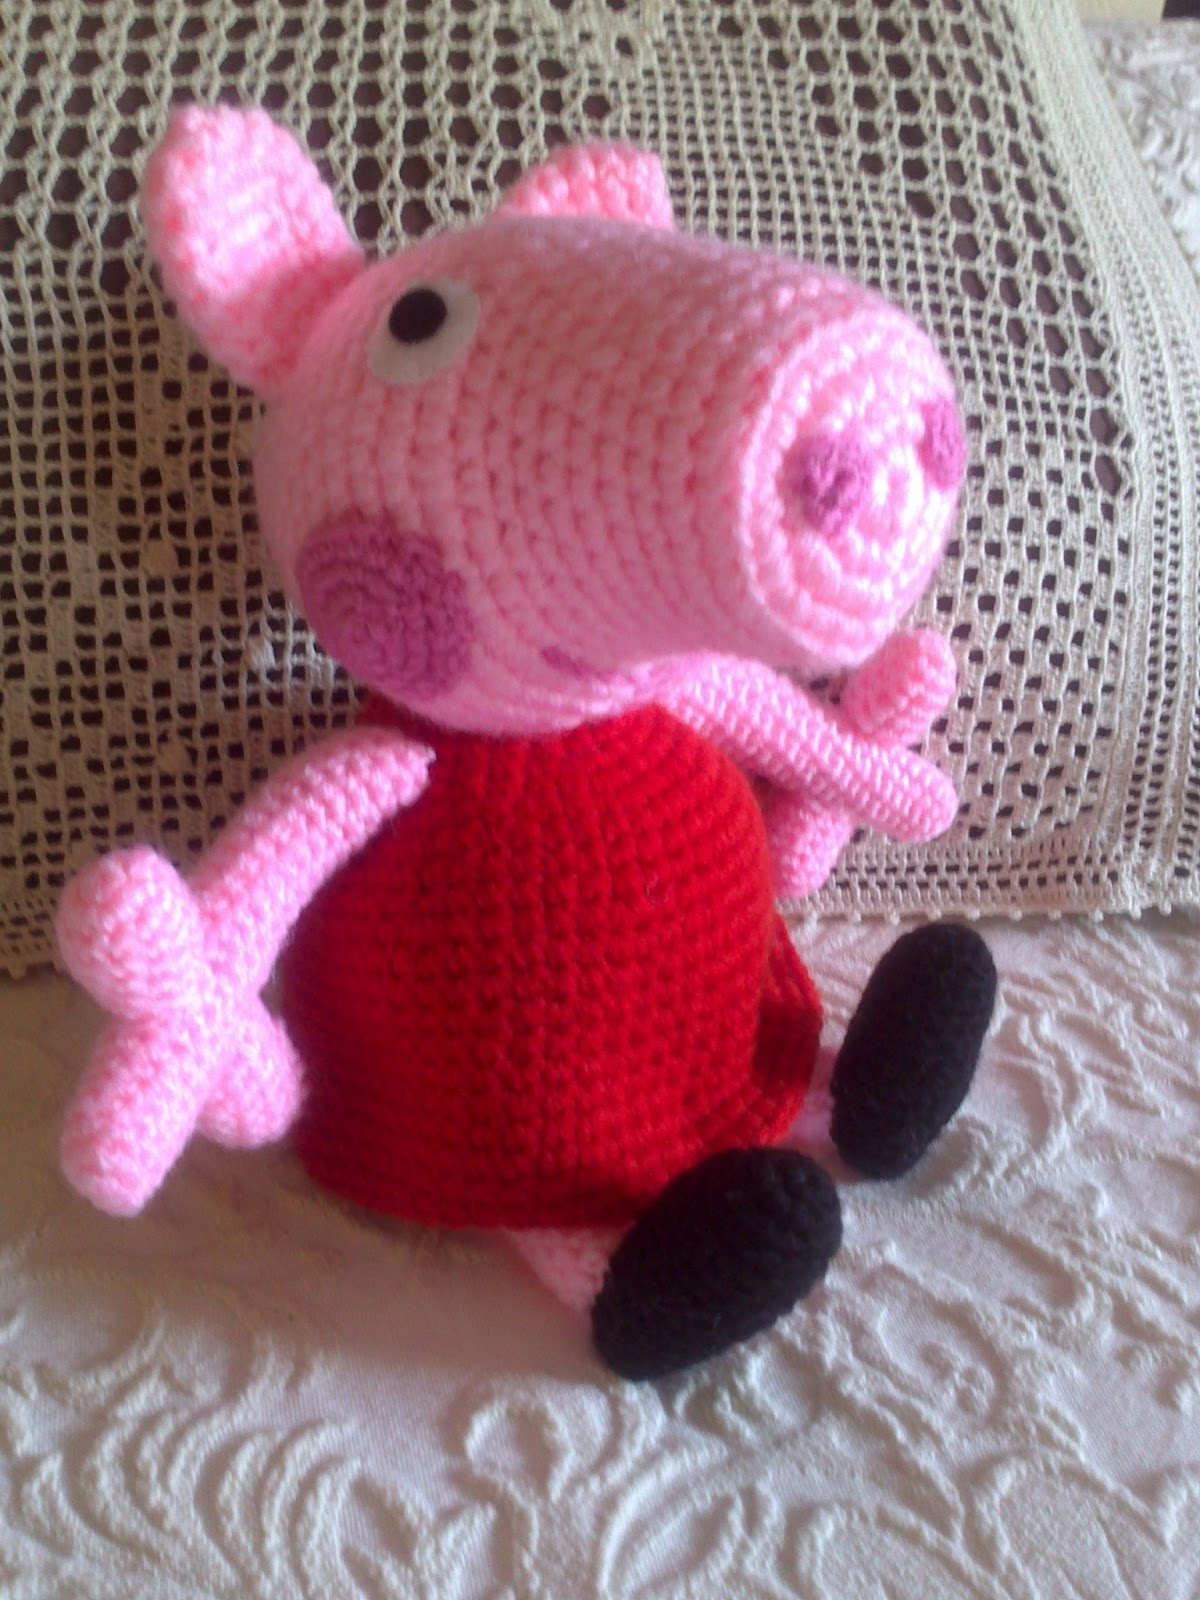 Pig Rabbit Amigurumi Patron : 1000+ images about tele amigurumi on Pinterest Amigurumi ...